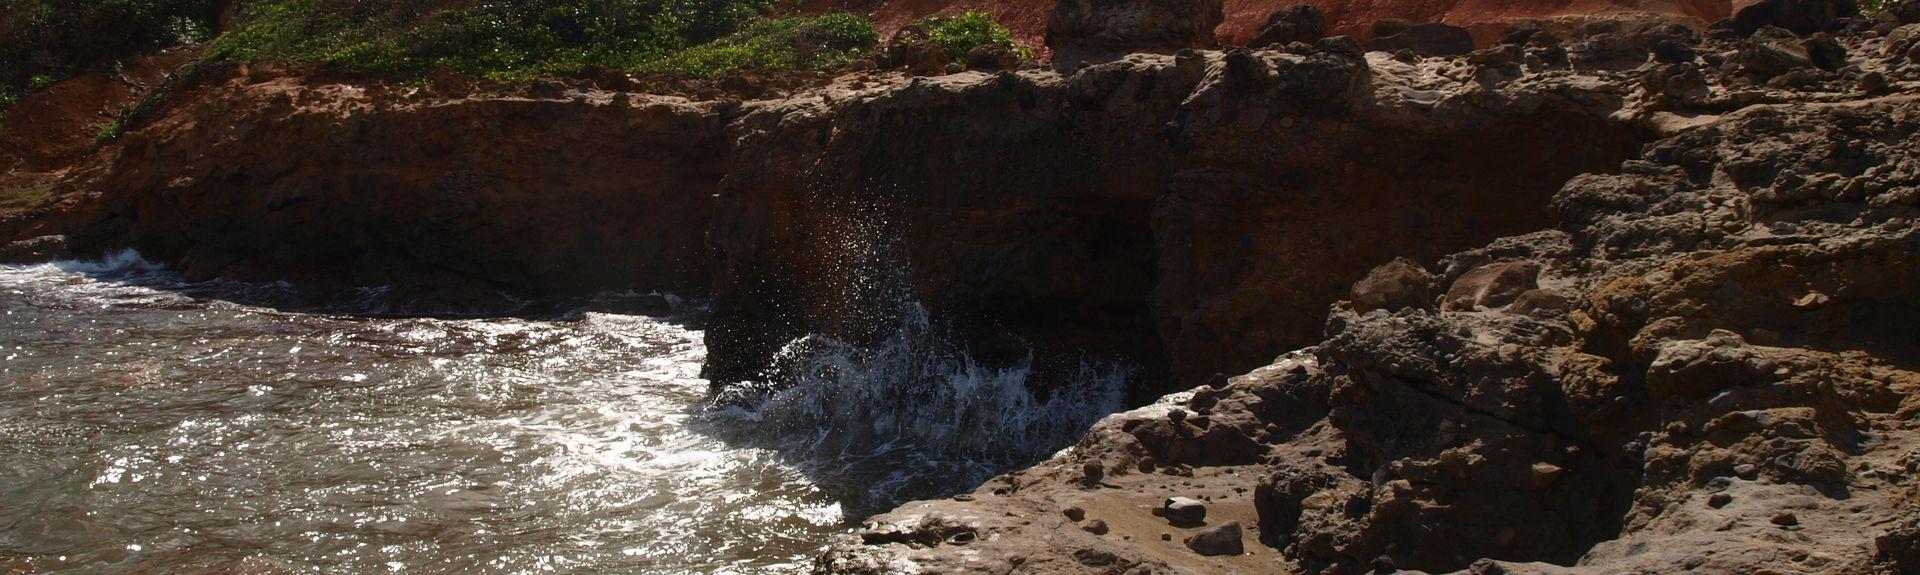 Parco Nazionale Cabrits, Cabrits, Dominica